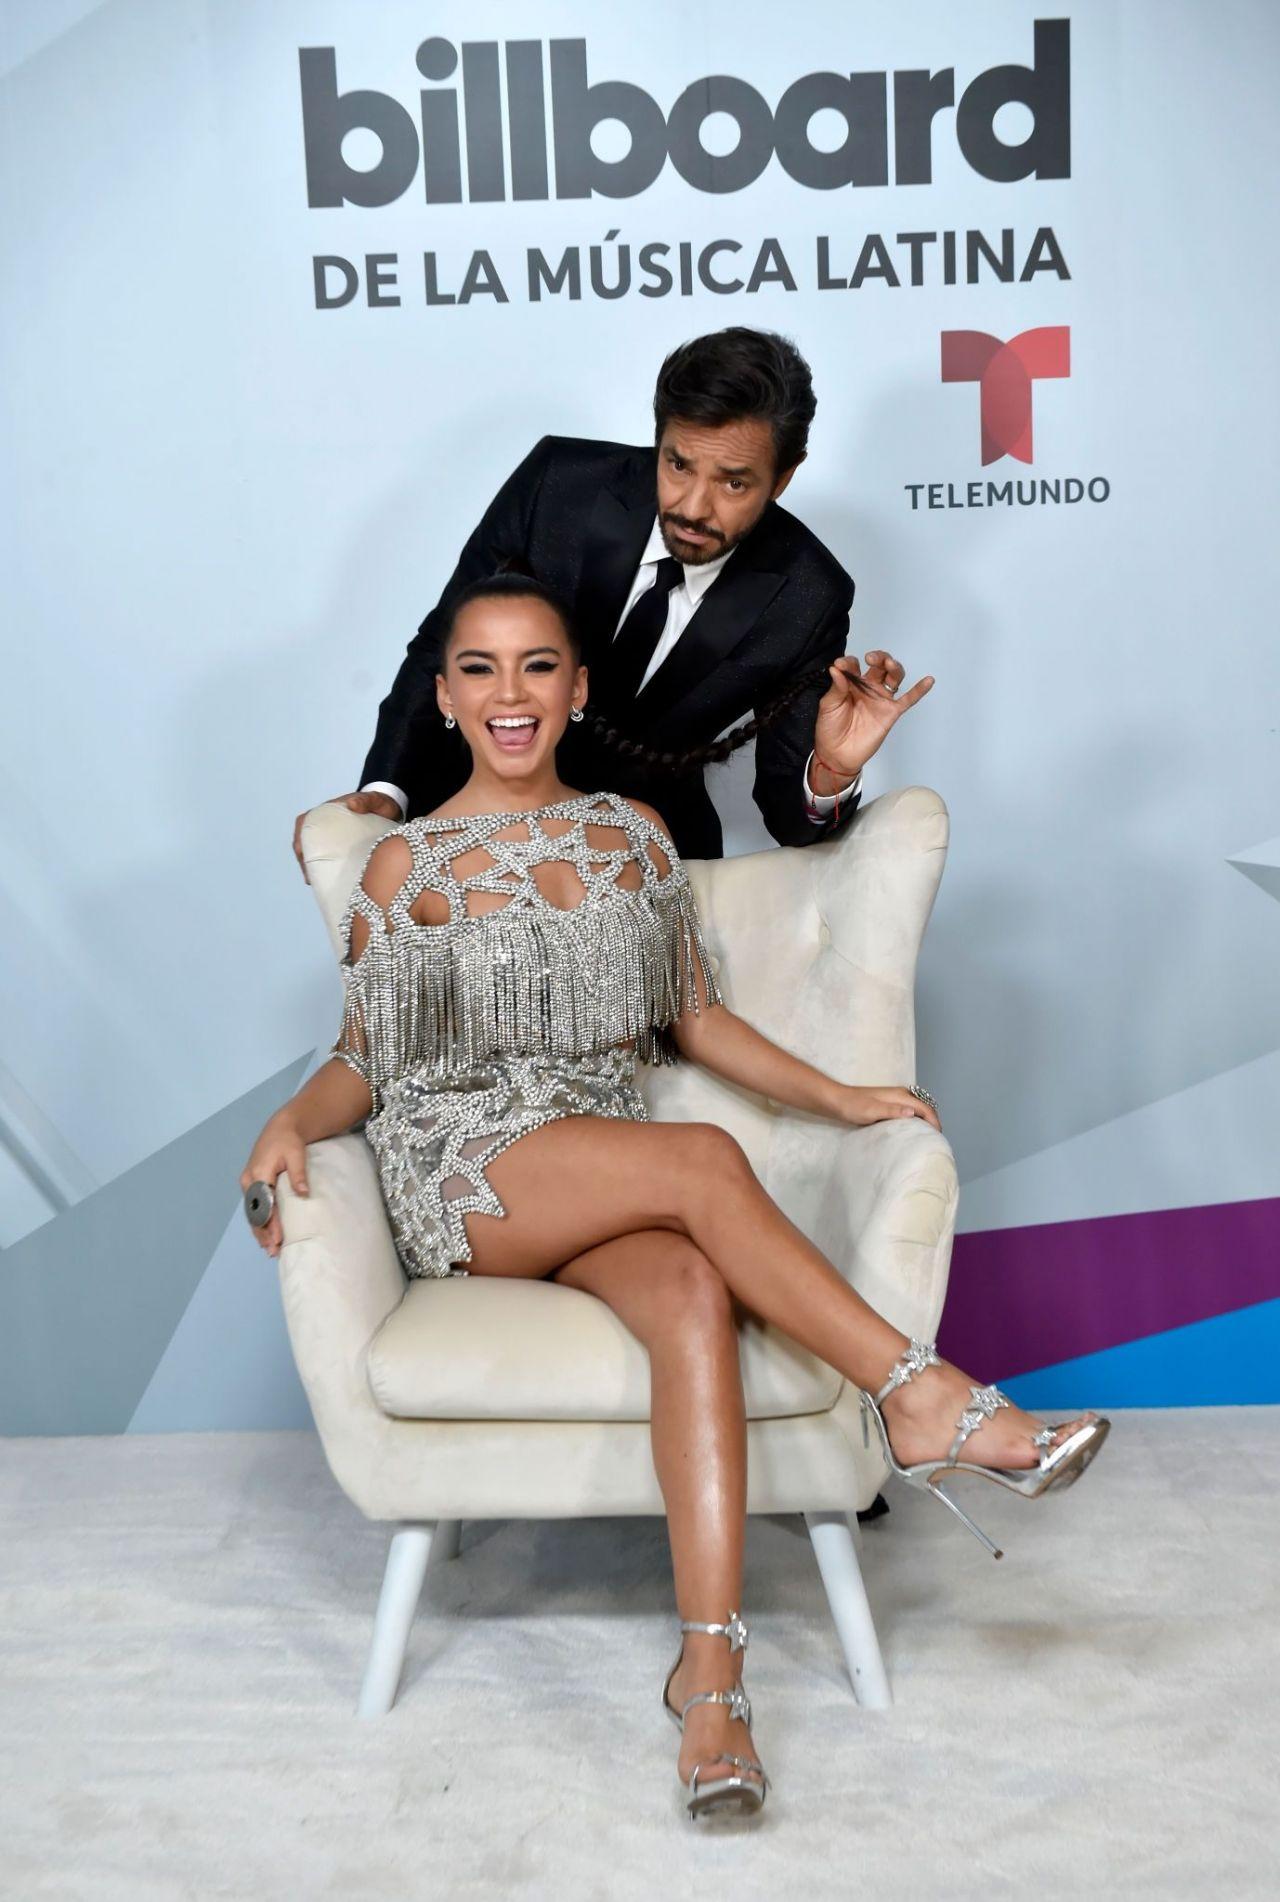 Press Room At The Z100 S Jingle Ball: 2019 Billboard Latin Music Awards Press Room